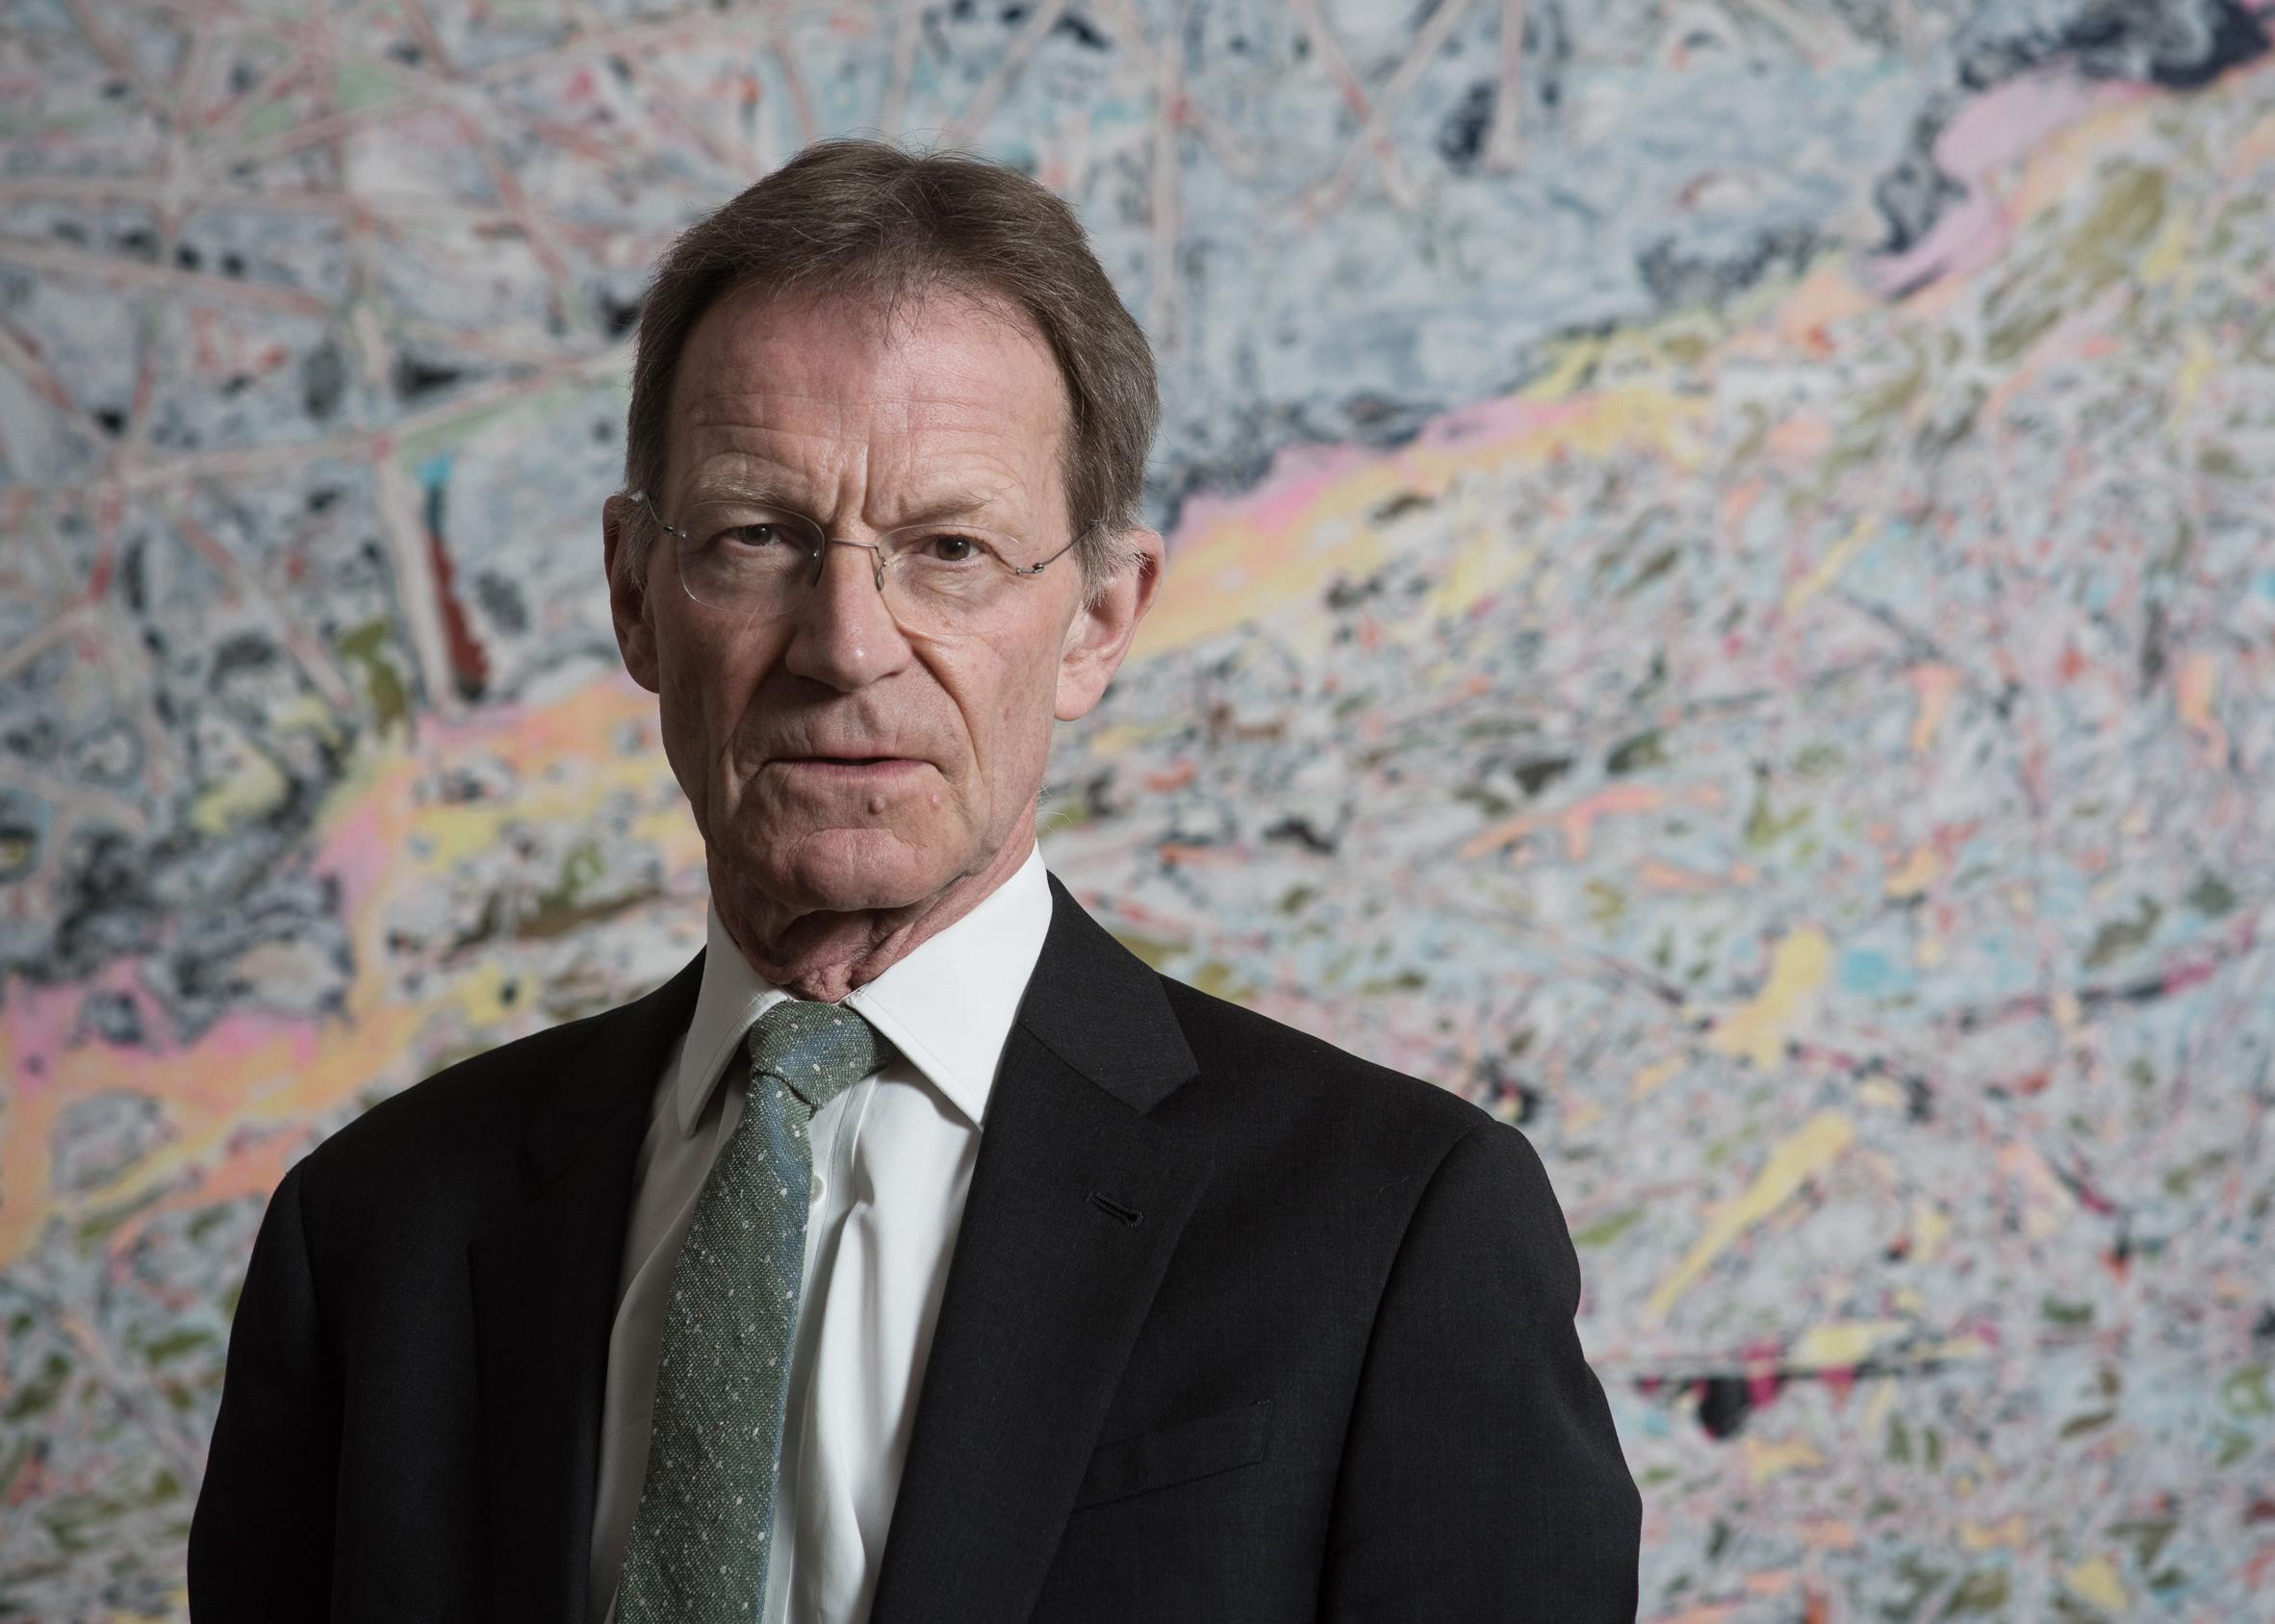 Nicholas Serota steps down as director of the Tate Modern